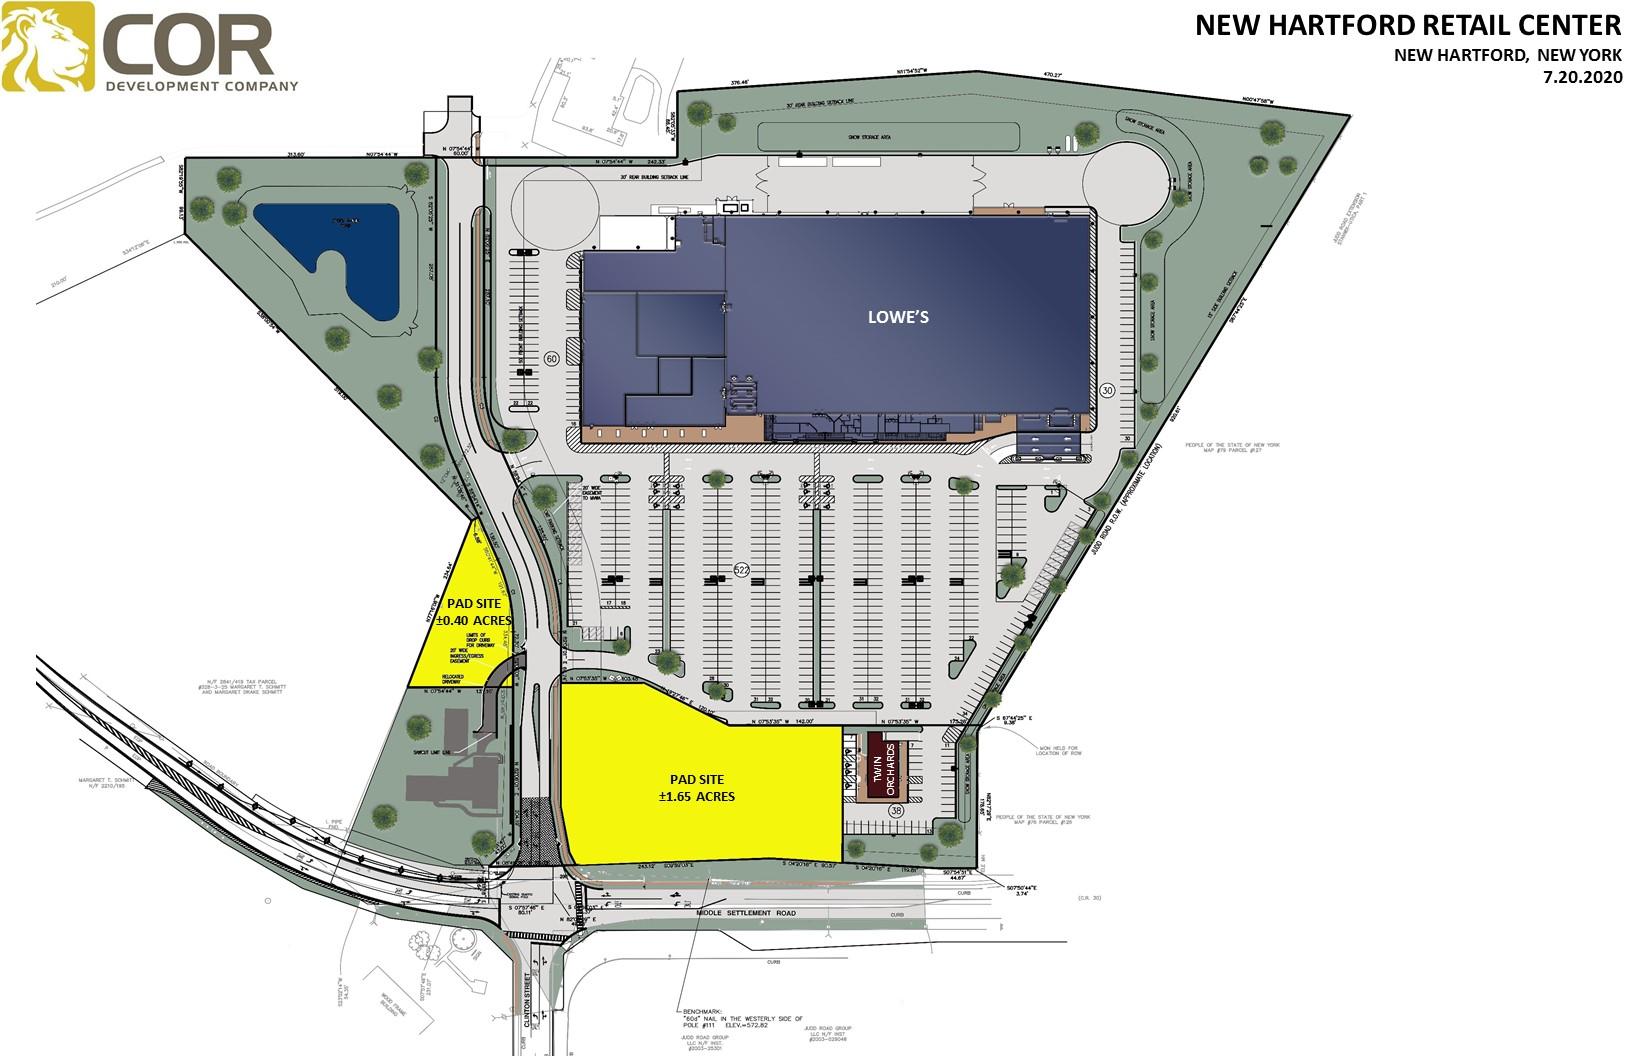 NEW HARTFORD RETAIL CENTER SITE PLAN - New Hartford Retail Center – New Hartford, NY